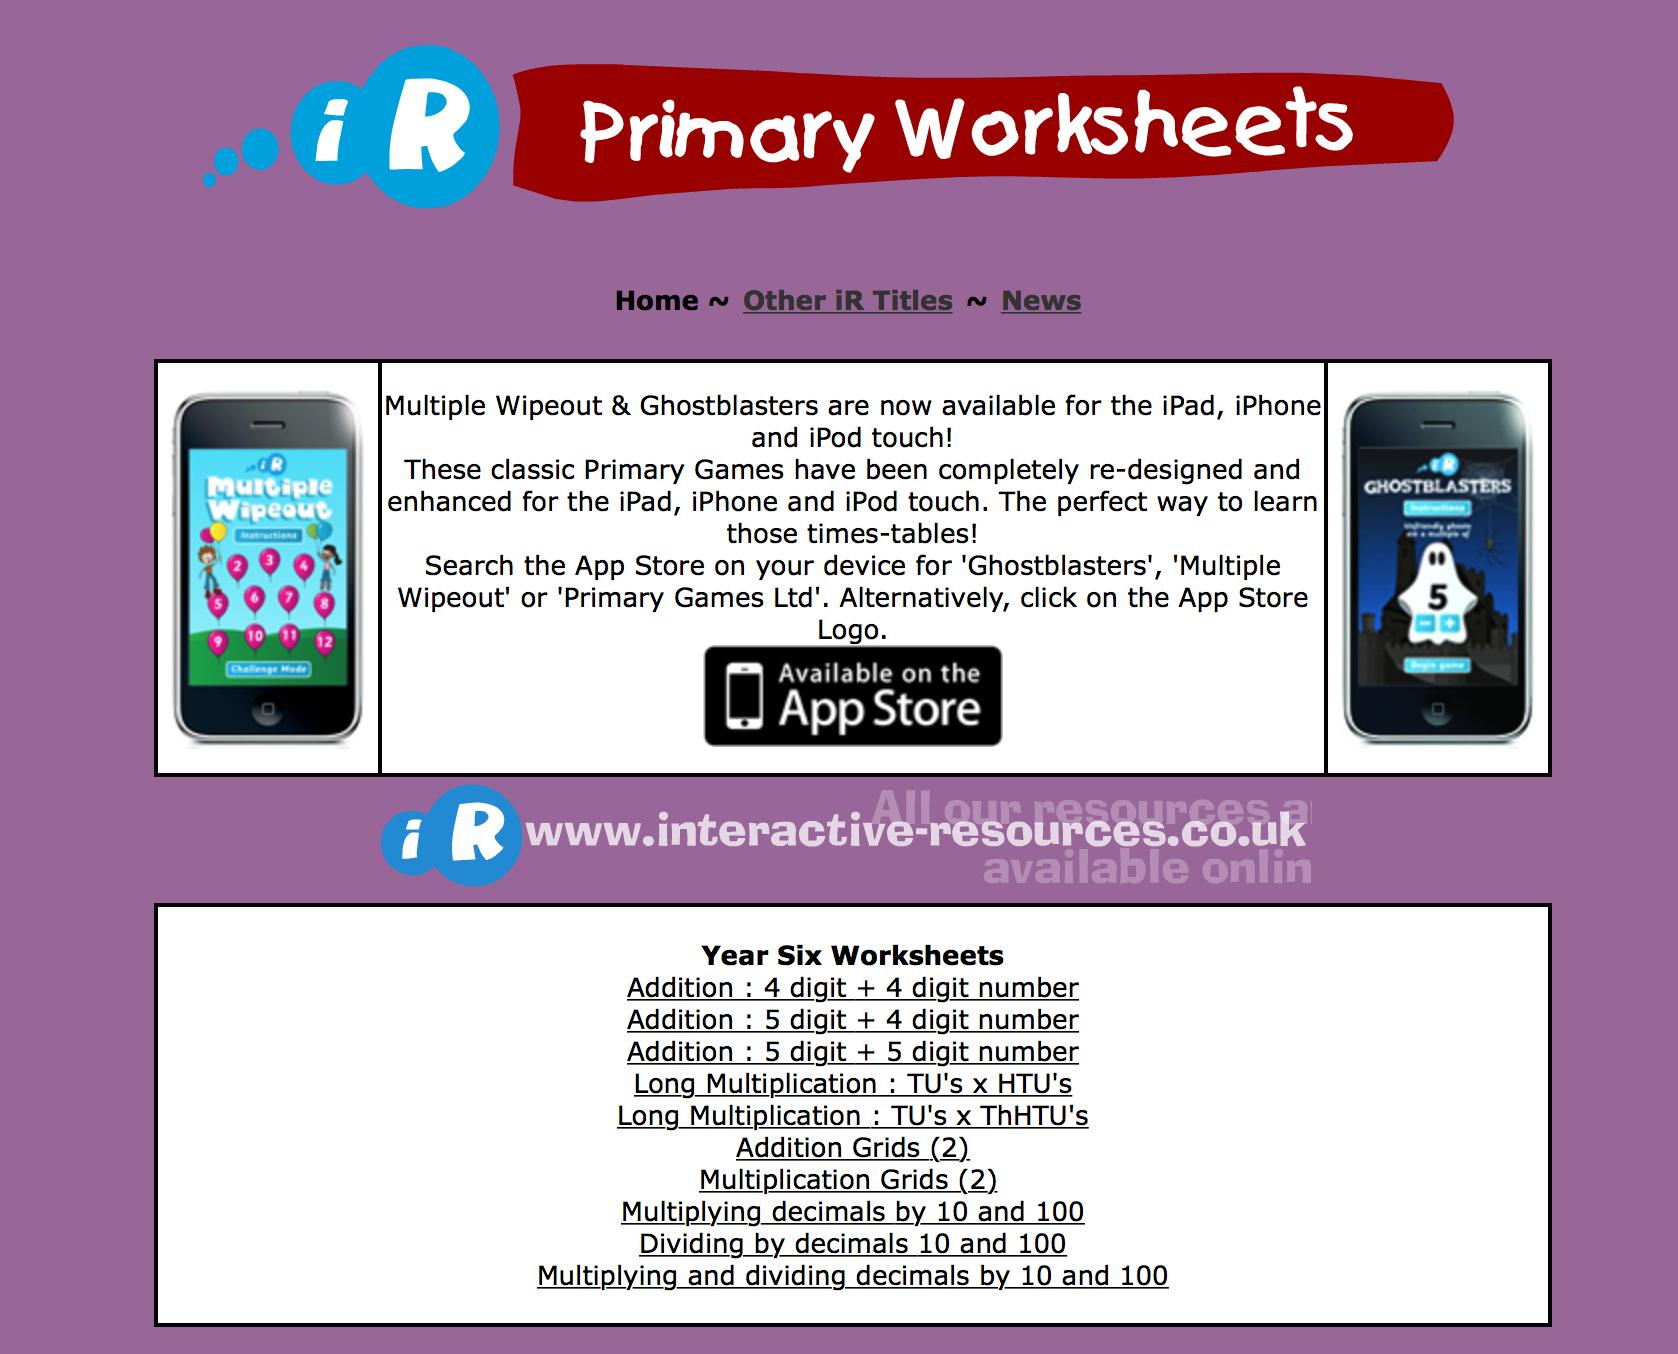 Primary Worksheets - Maths | E-Learning: Mathematics | Pinterest ...